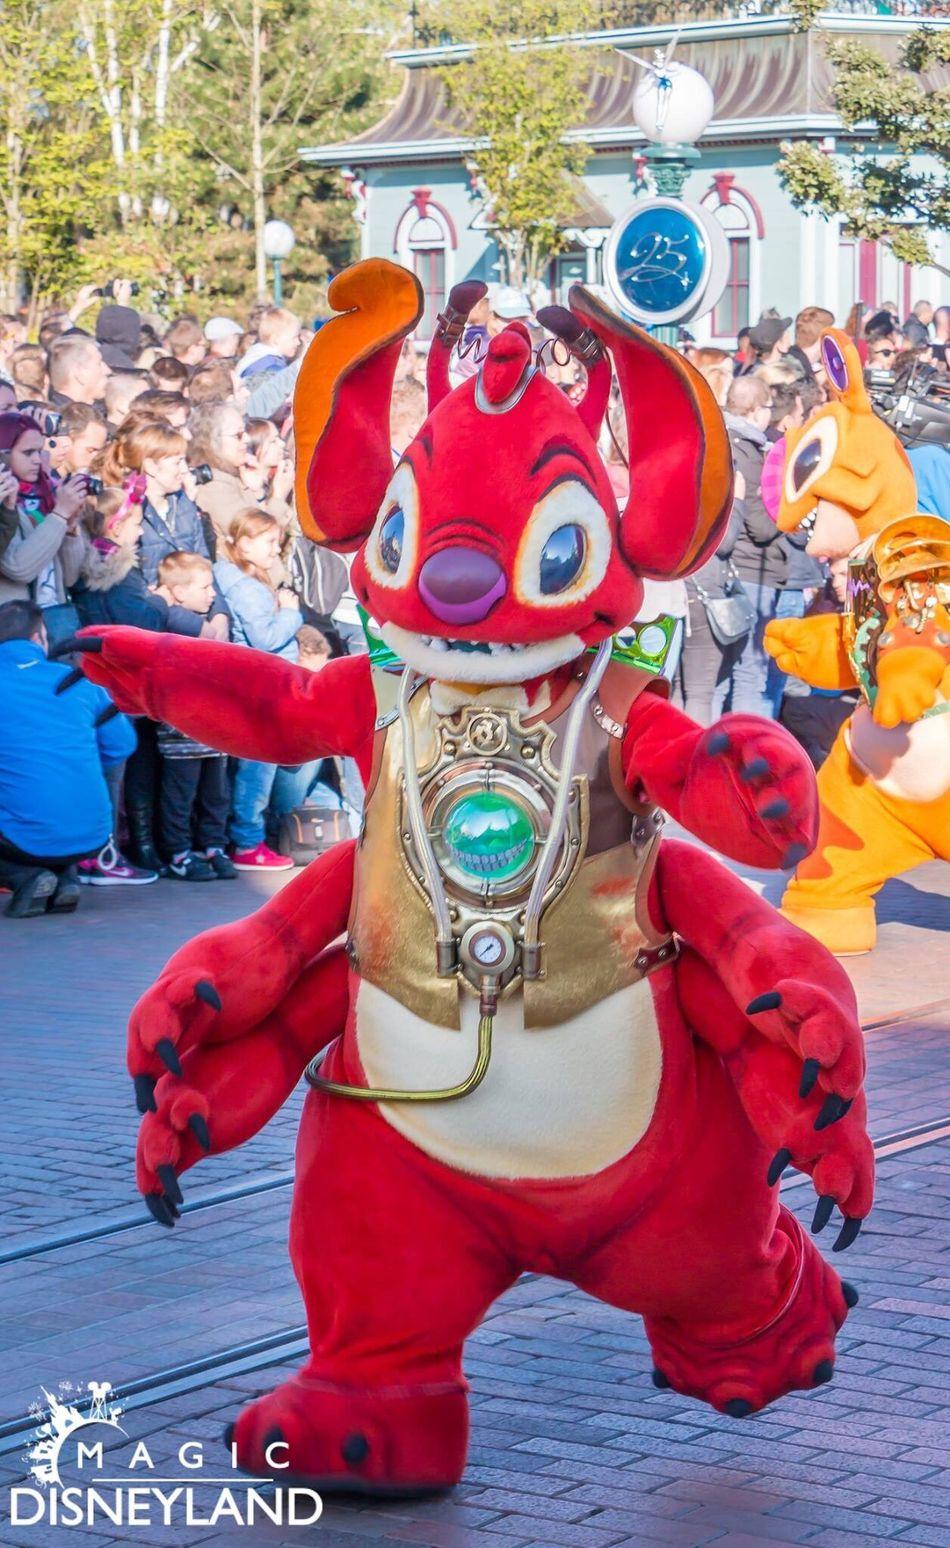 Arts Culture And Entertainment Day Disneylandparis Amusement Park Disneyland Paris Disney Travel Destinations Celebration 25thanniversary Disneyland Resort Paris Friendship Disneyland